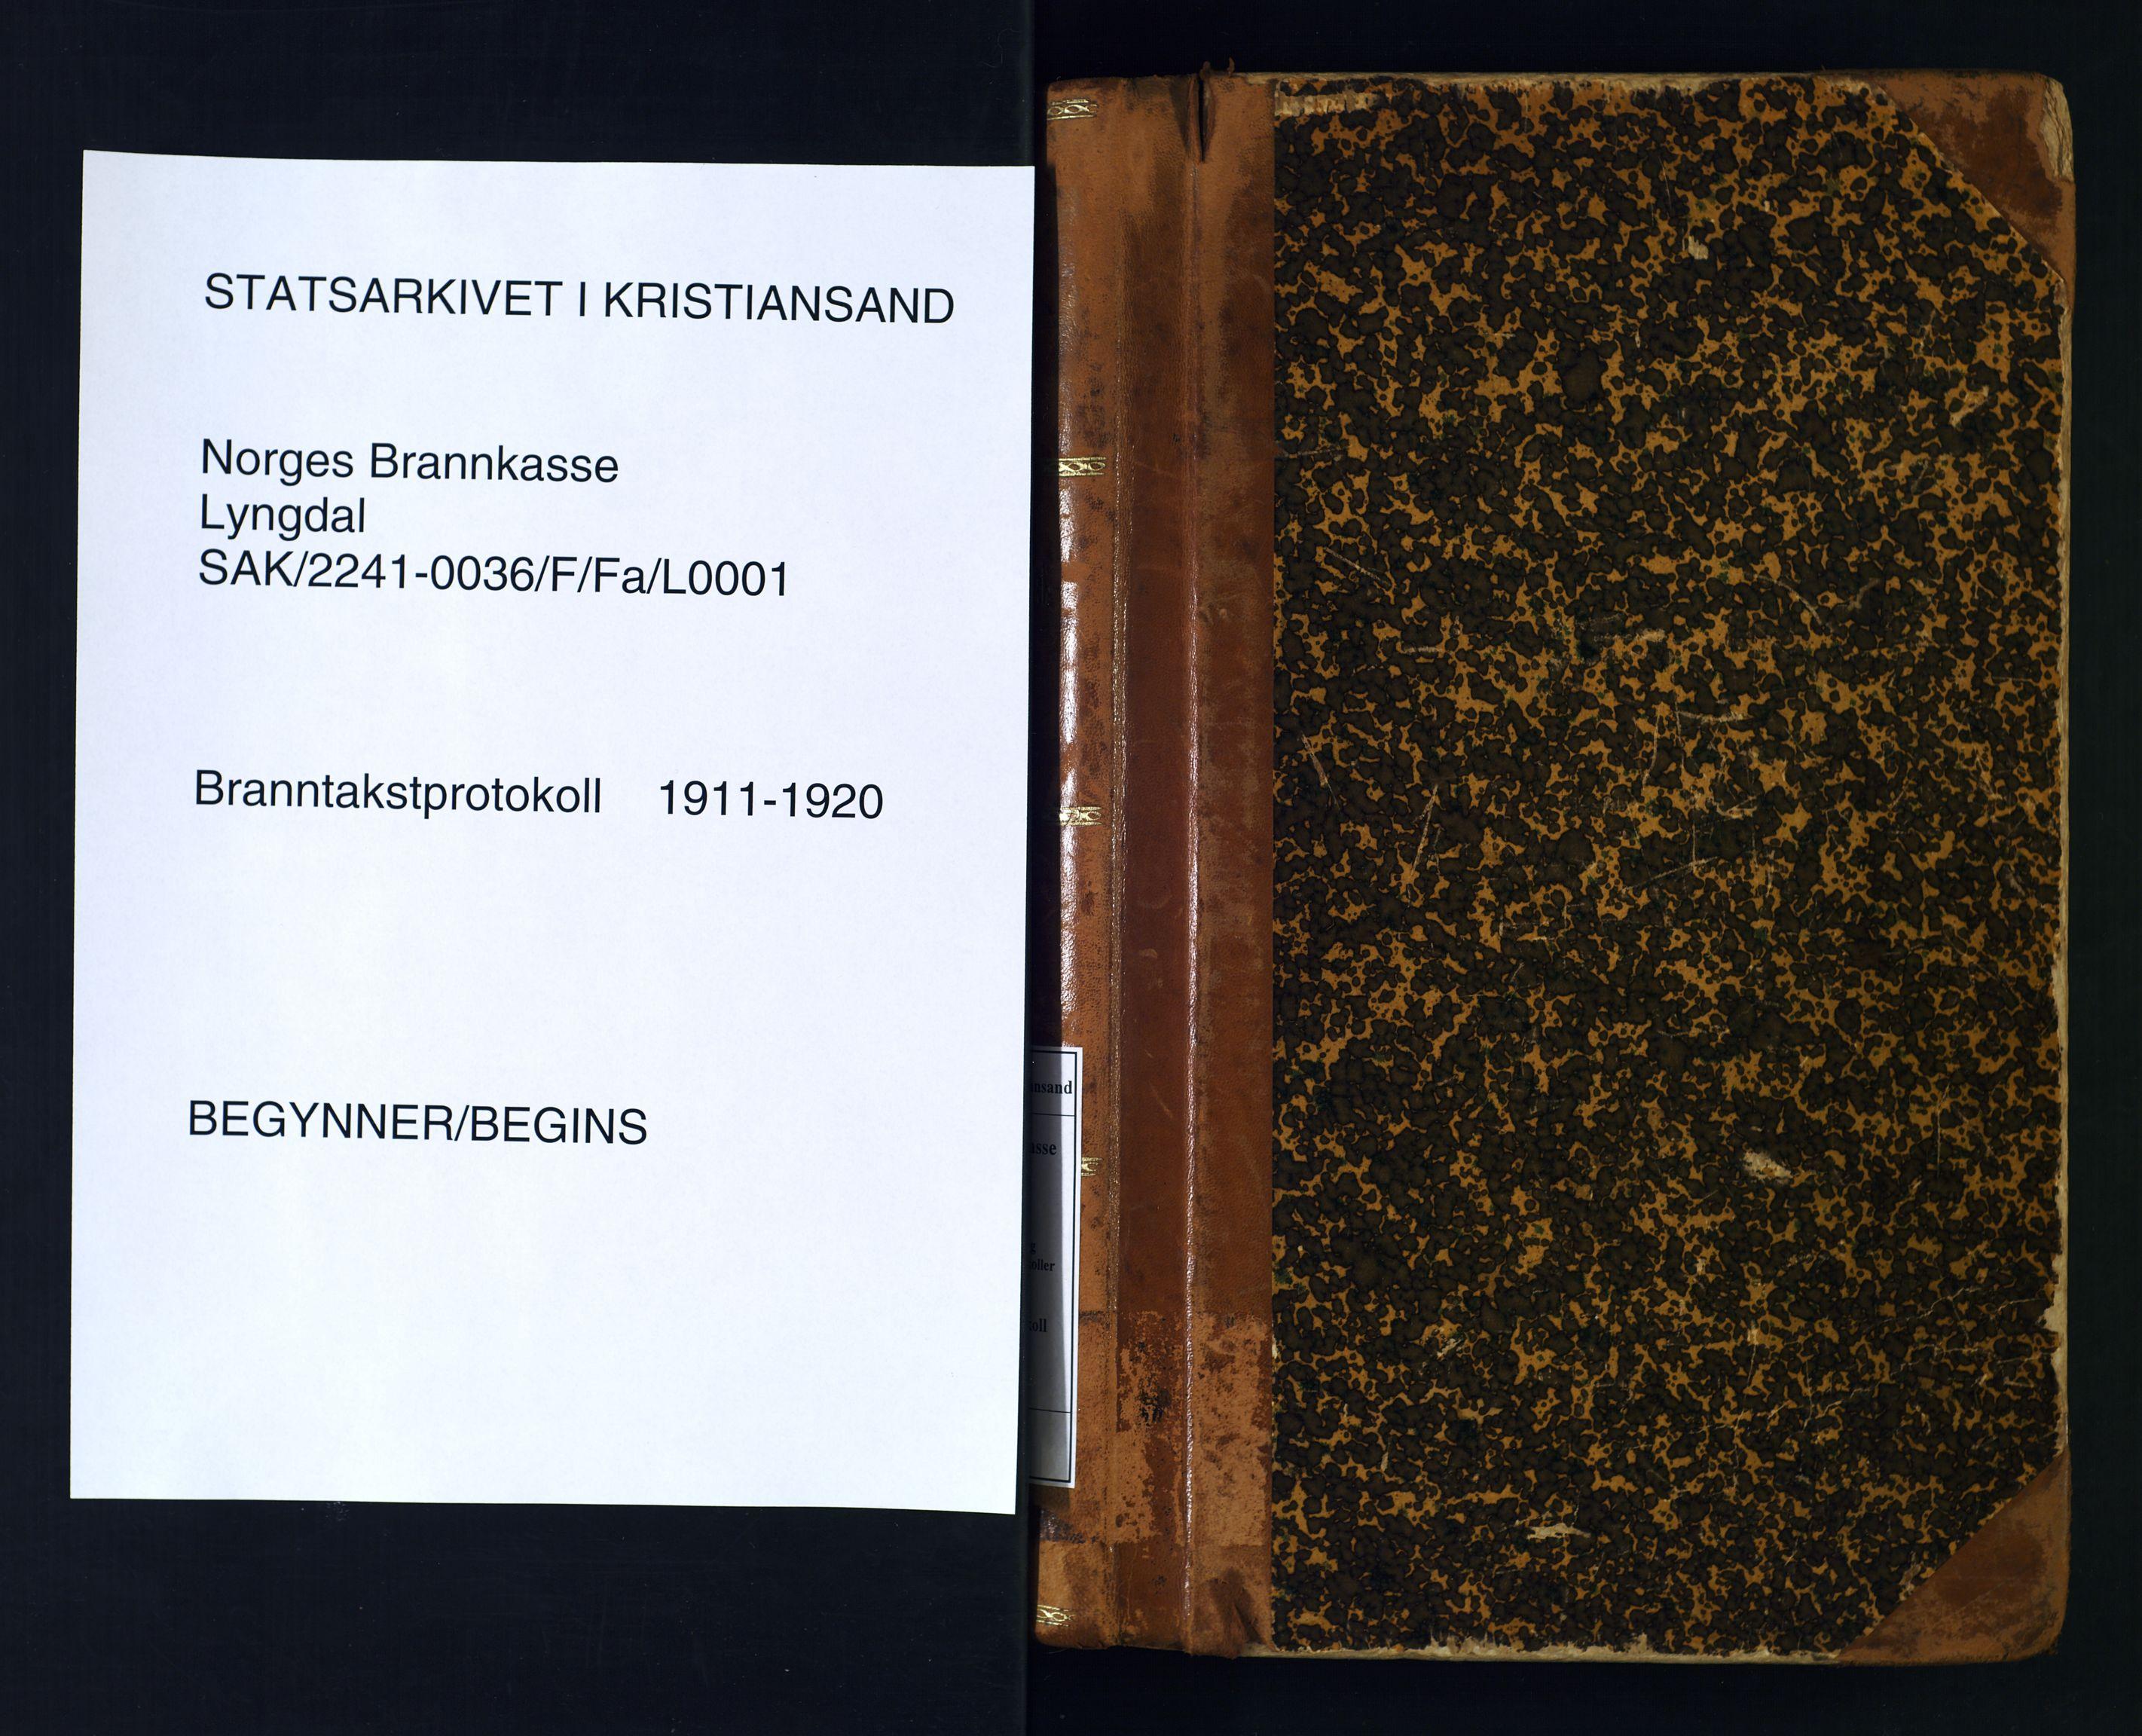 SAK, Norges Brannkasse Lyngdal, F/Fa/L0001: Branntakstprotokoll nr. 1, 1911-1920